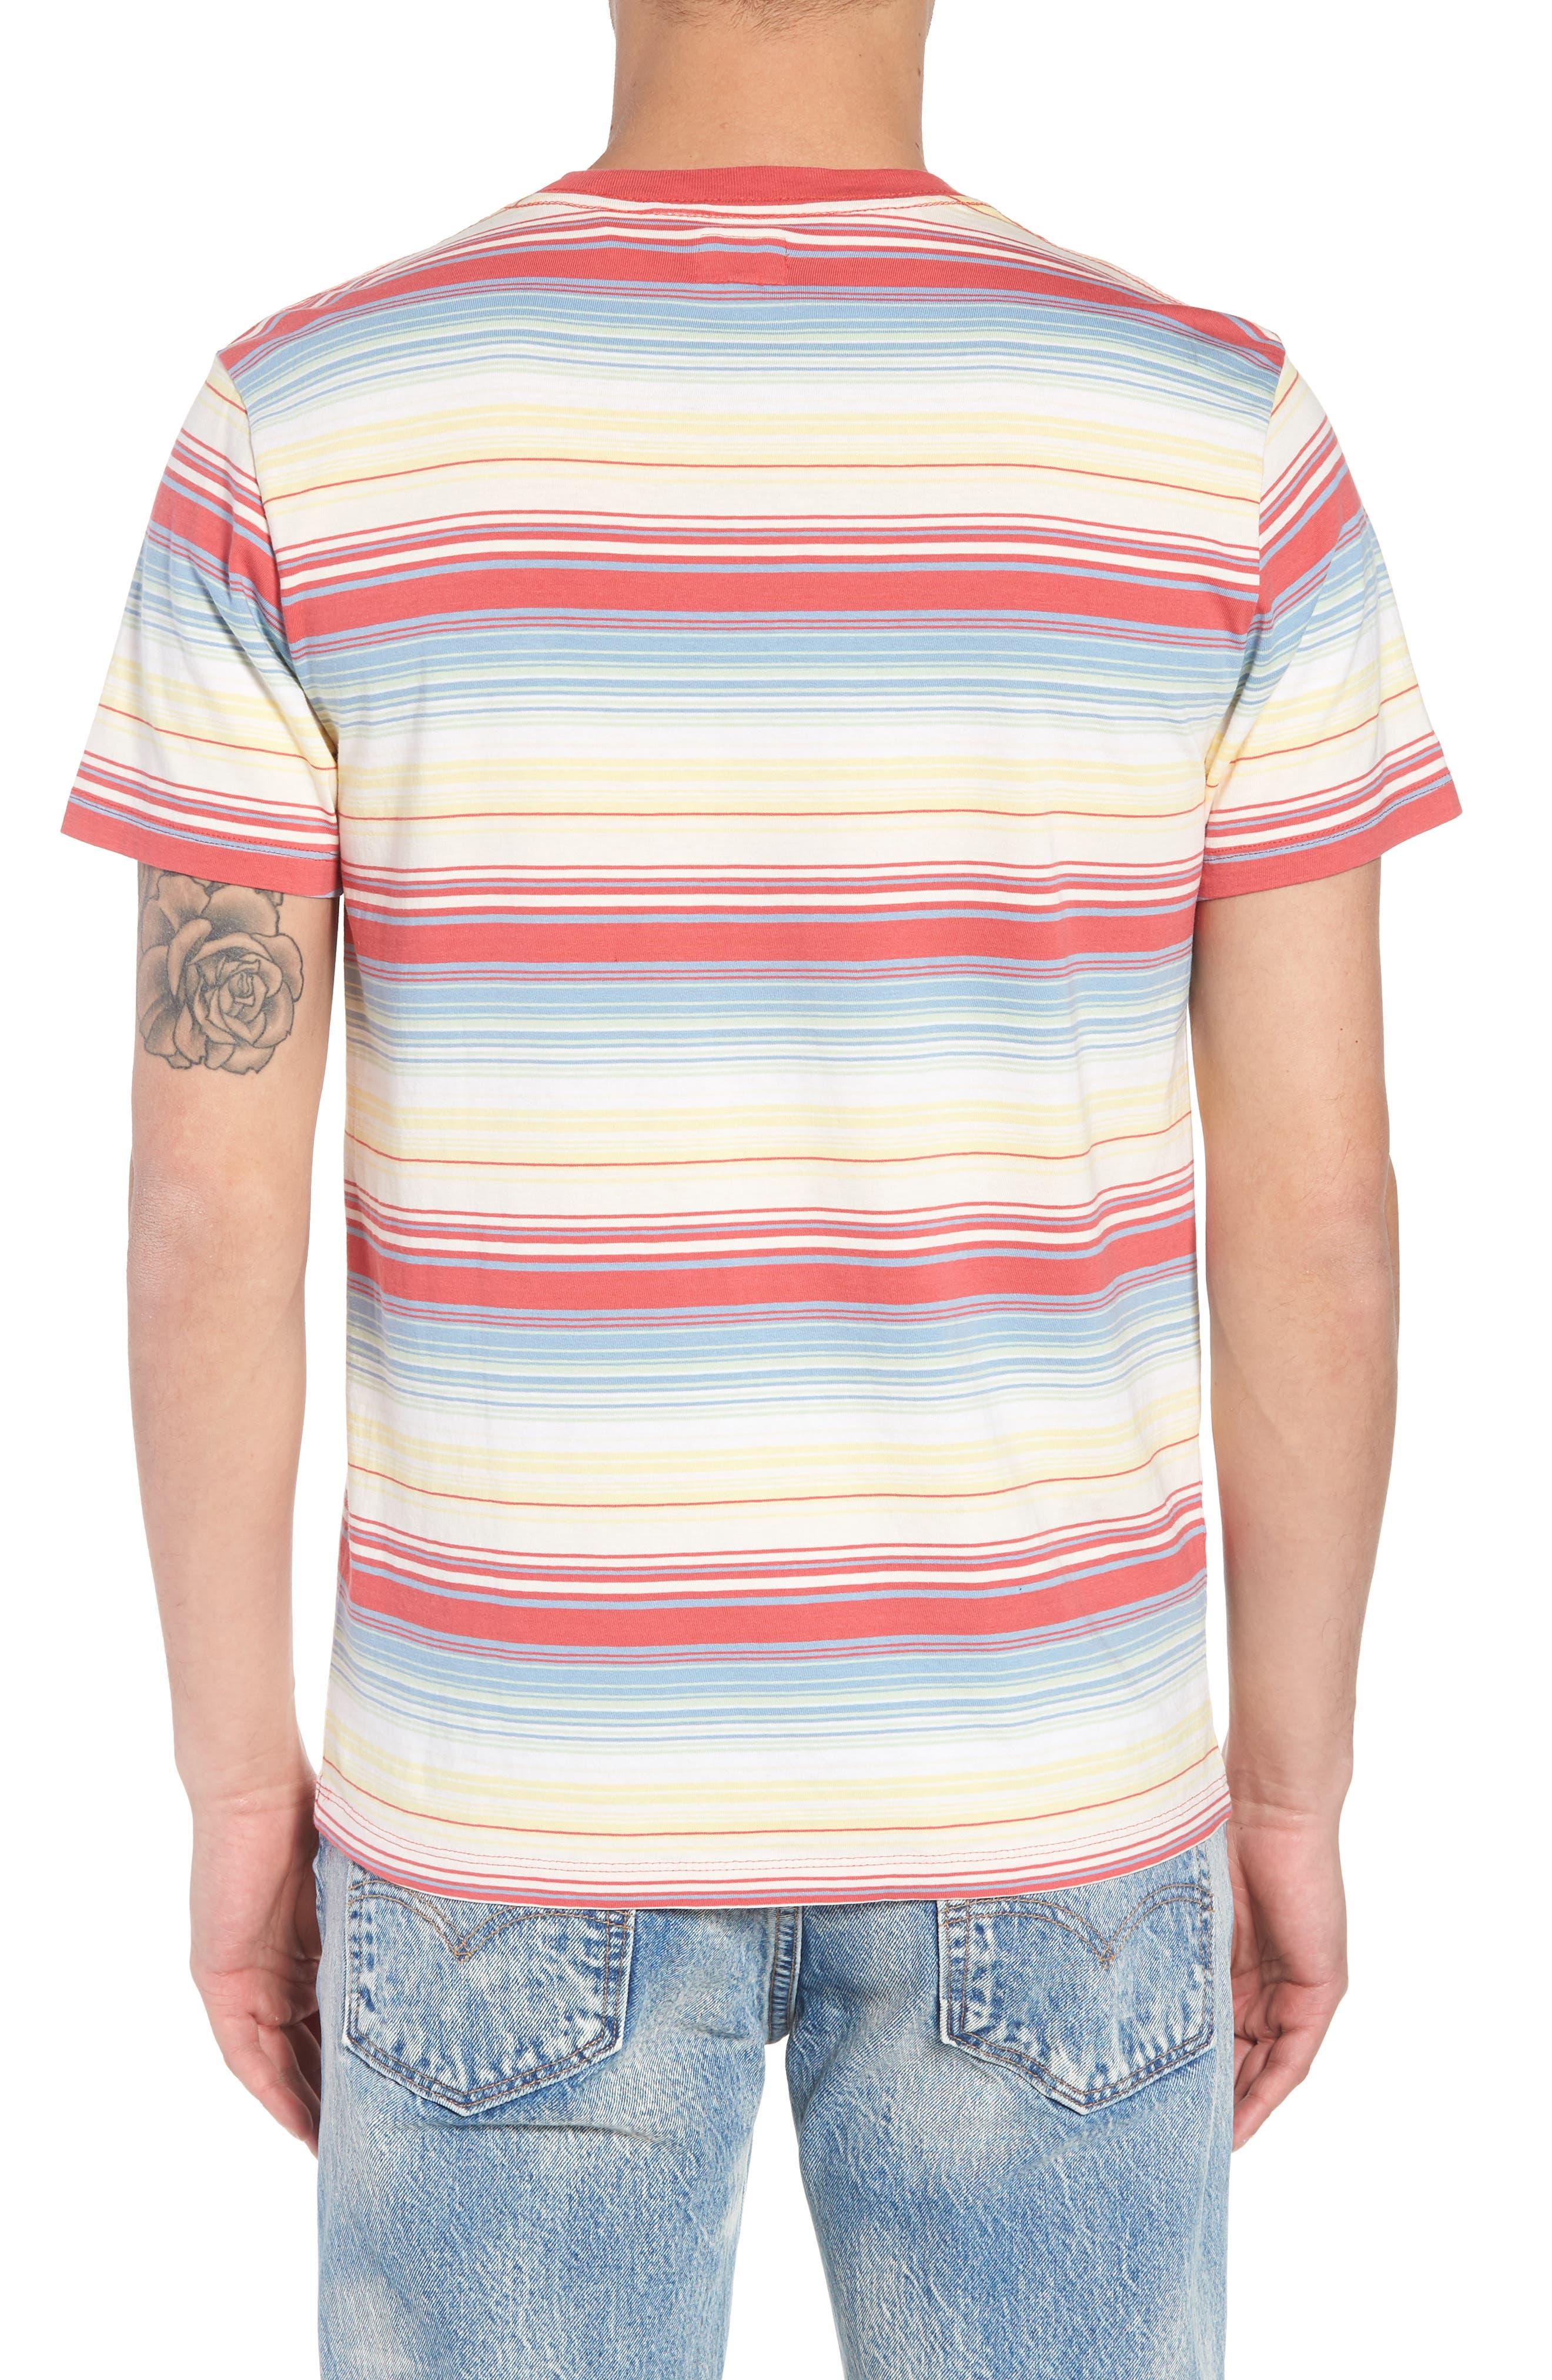 Set-In Sunset Pocket T-Shirt,                             Alternate thumbnail 2, color,                             Fiesta Stripe